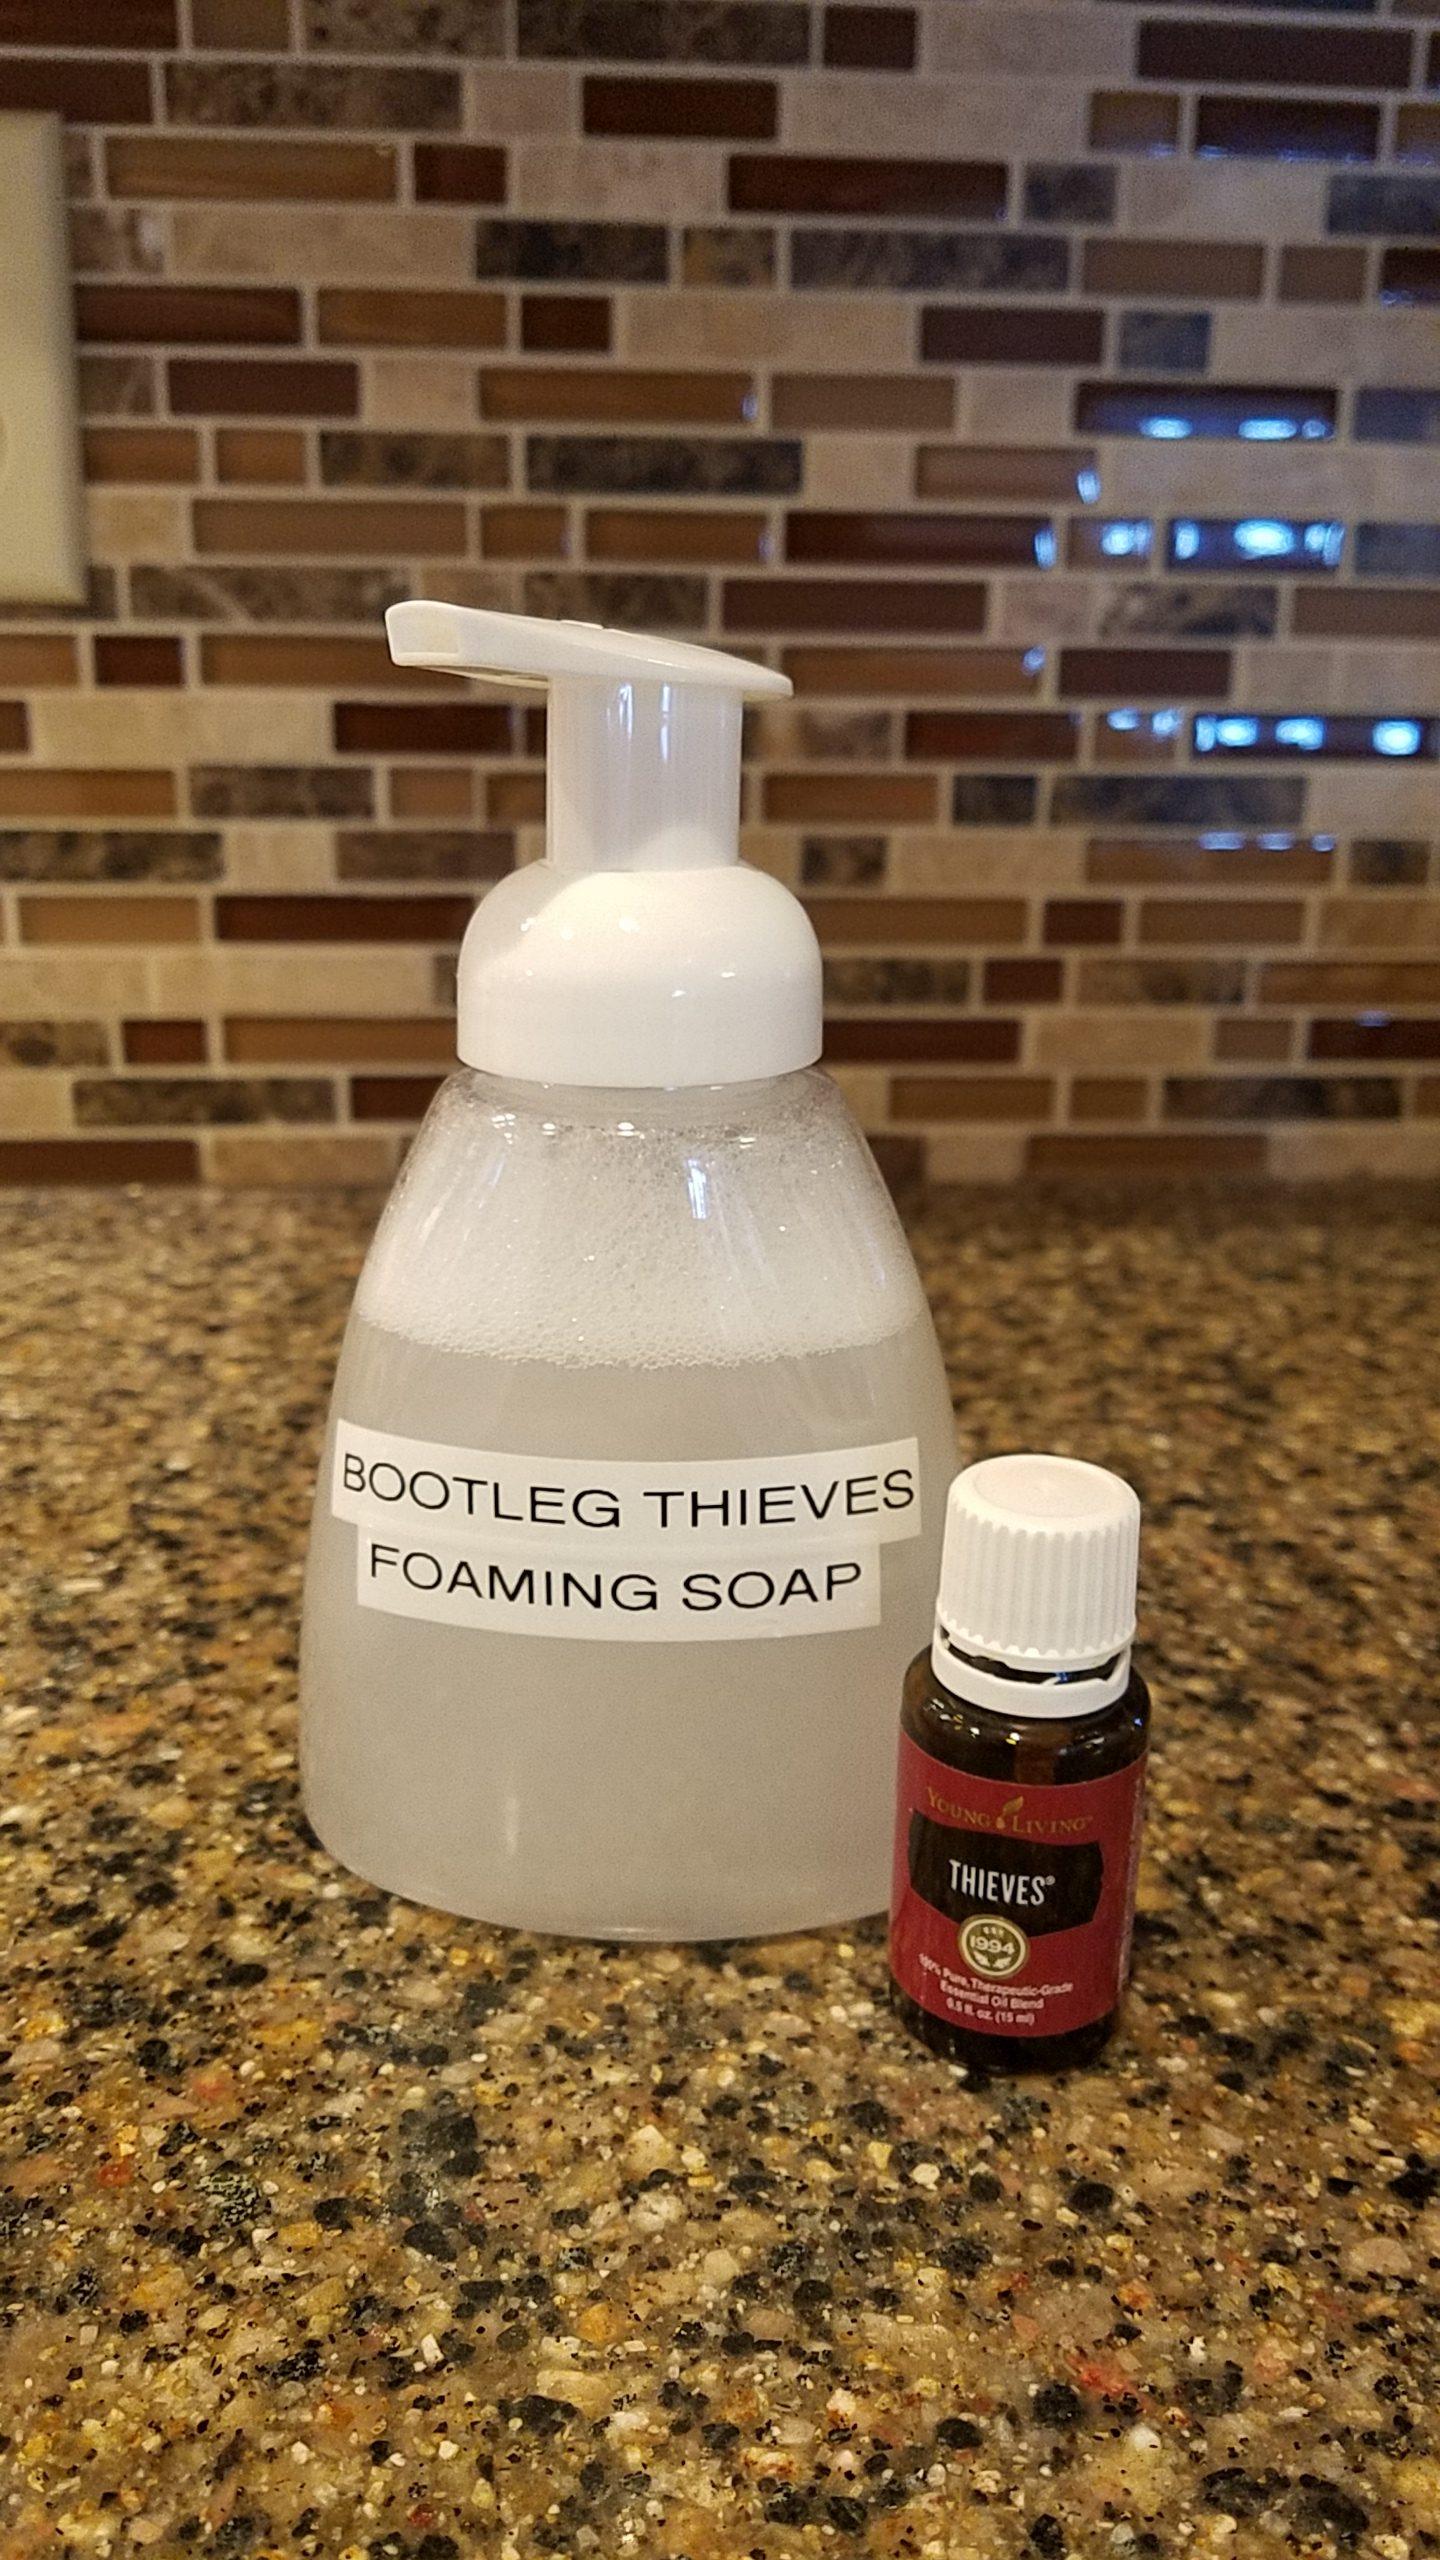 Bootleg Thieves Foaming Soap